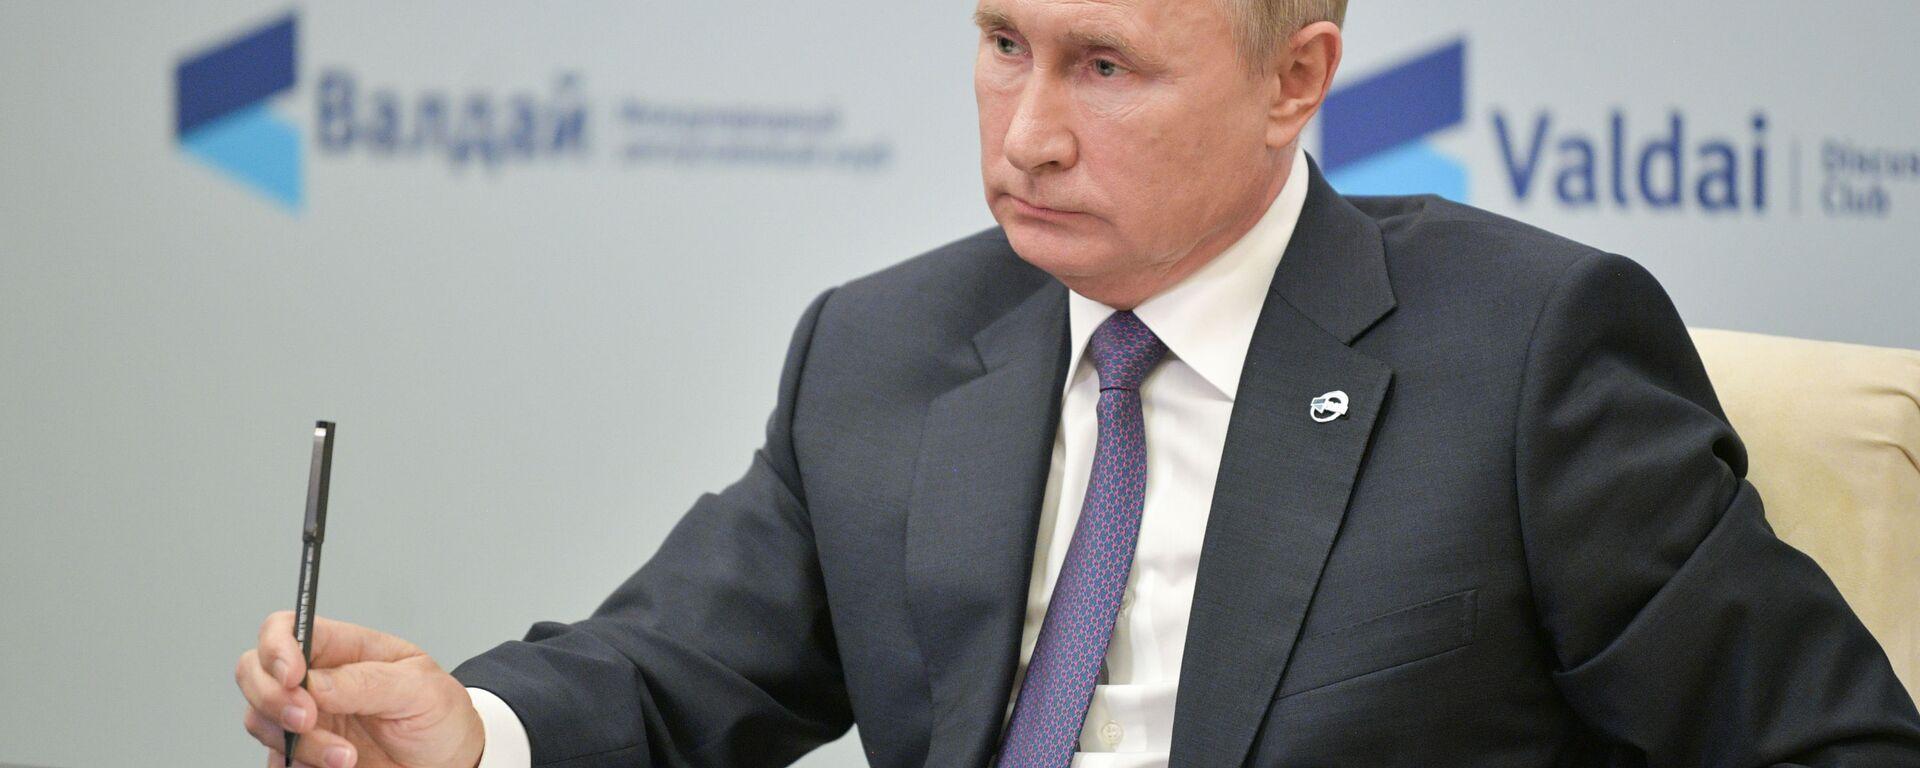 Predsednik Rusije Vladimir Putin - Sputnik Srbija, 1920, 04.12.2020